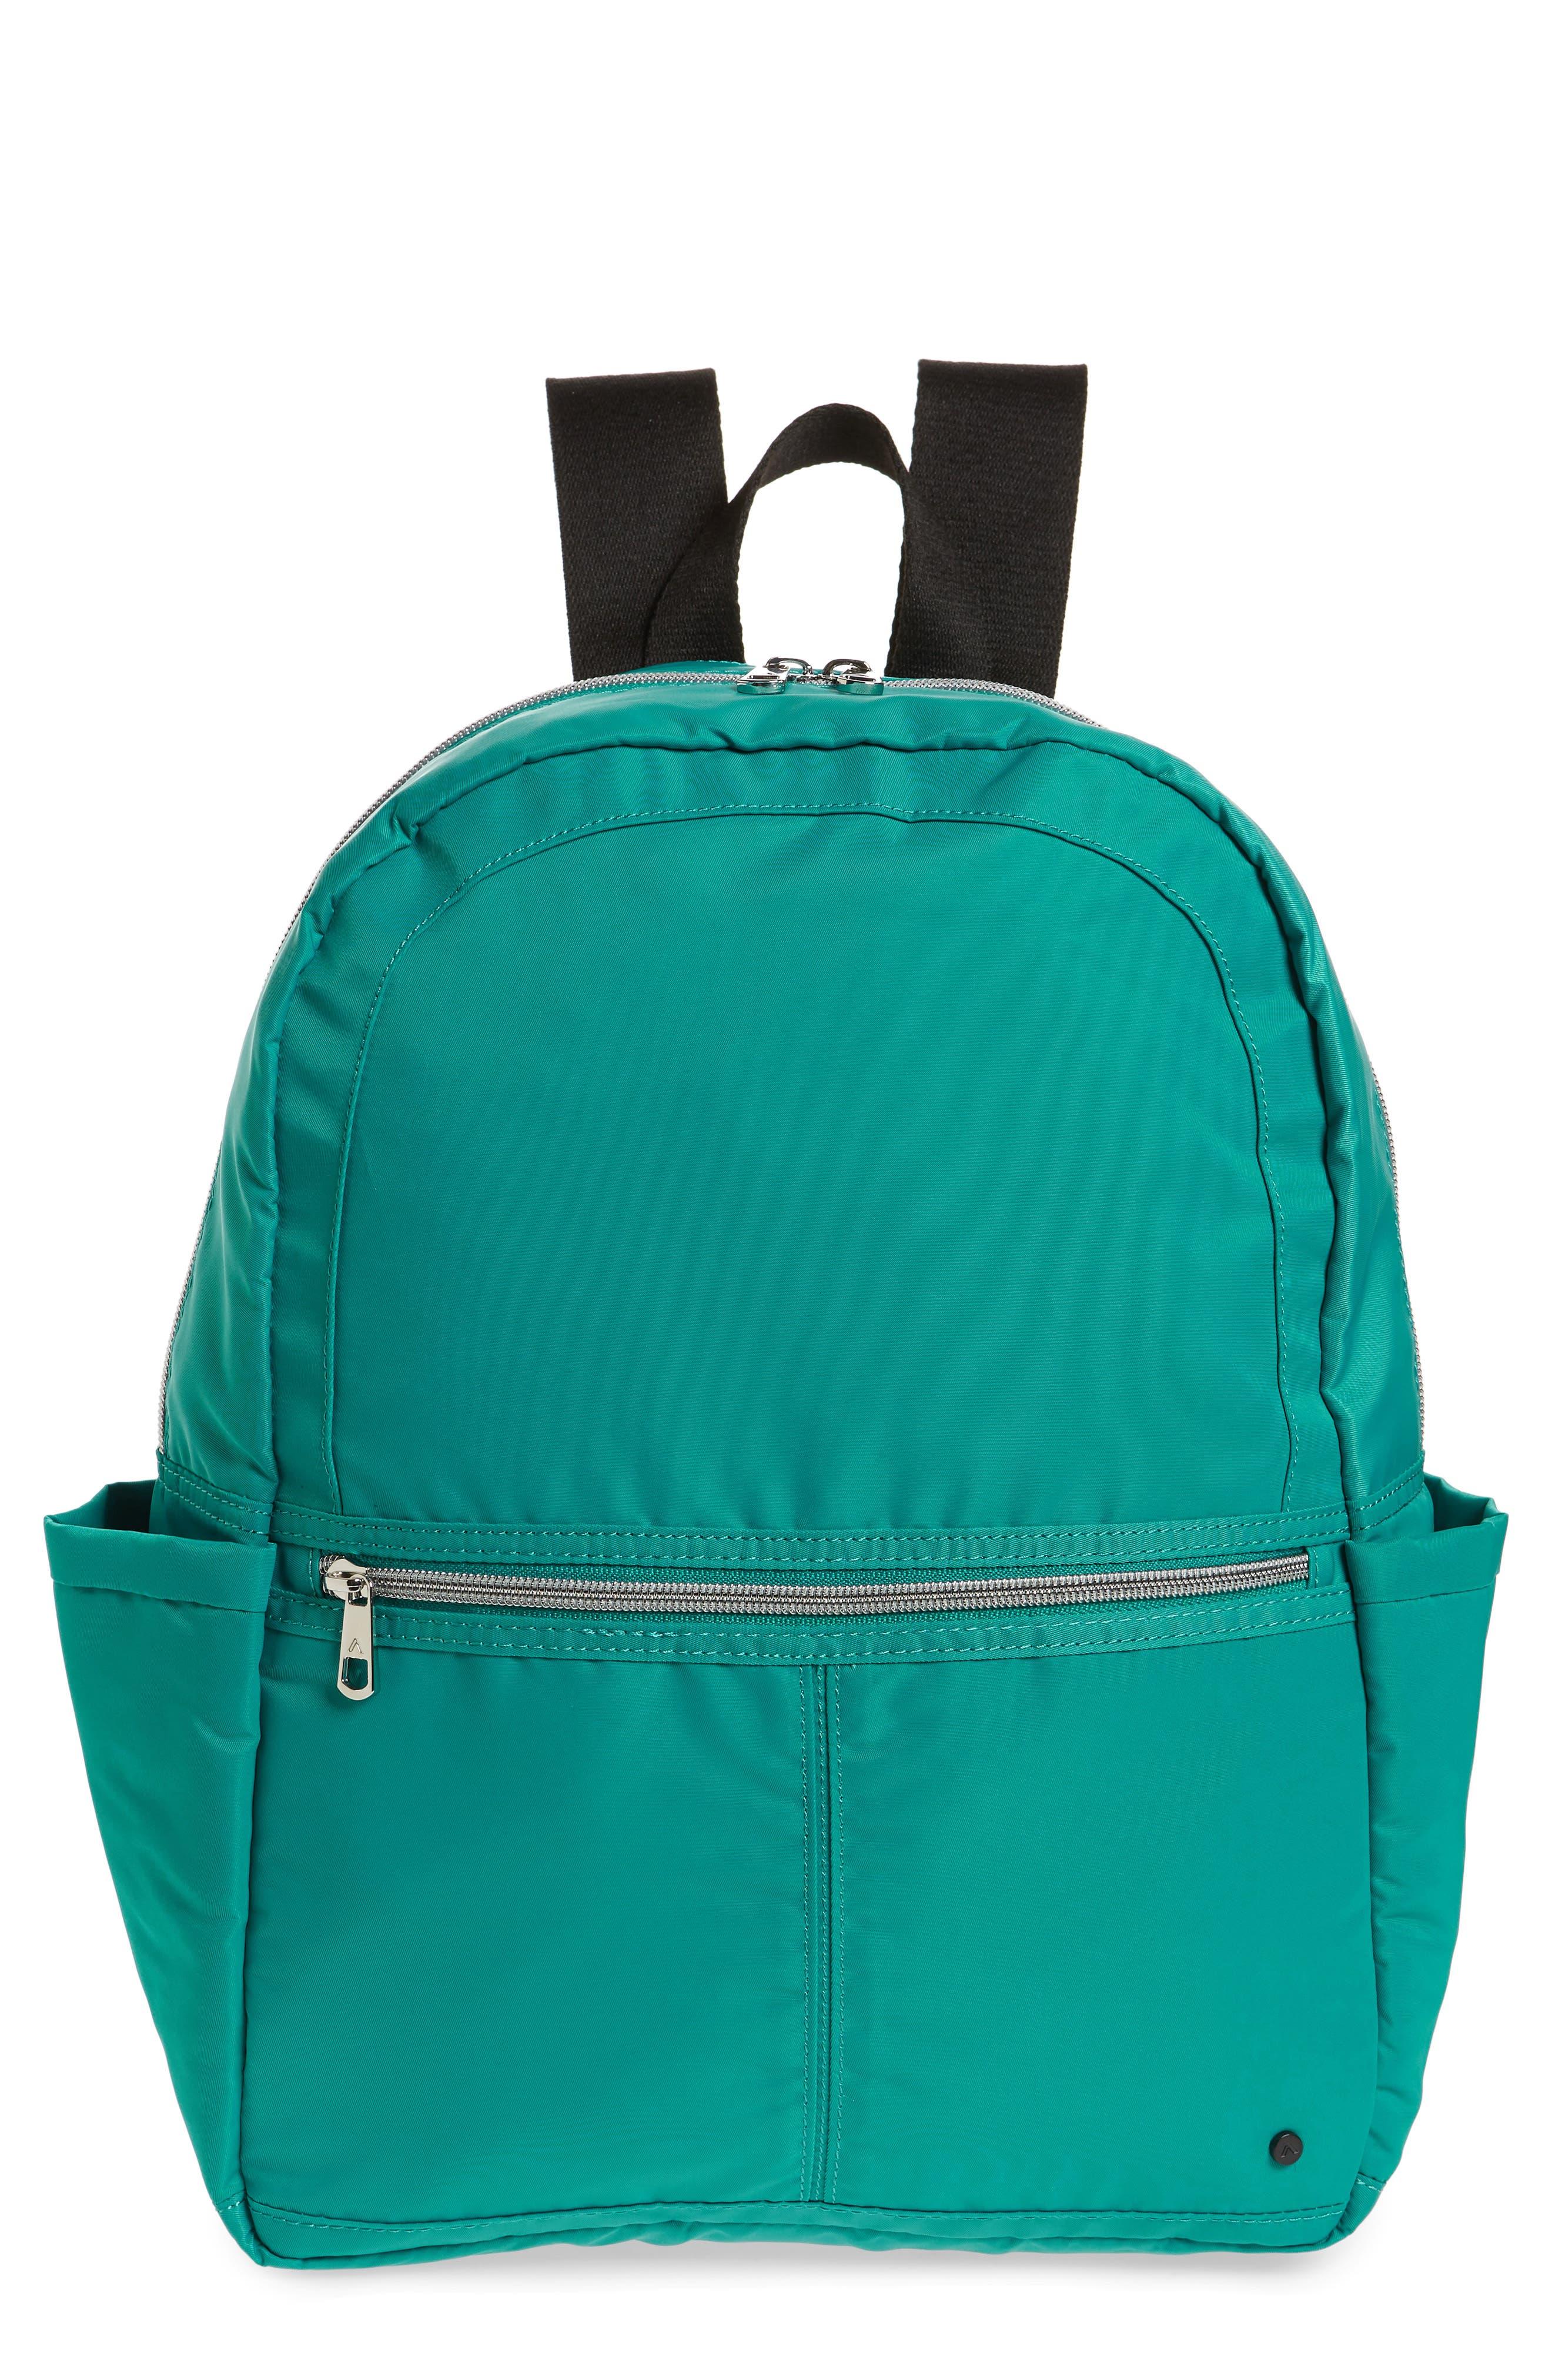 d38707cbf0f6 STATE Bags All Women   Nordstrom